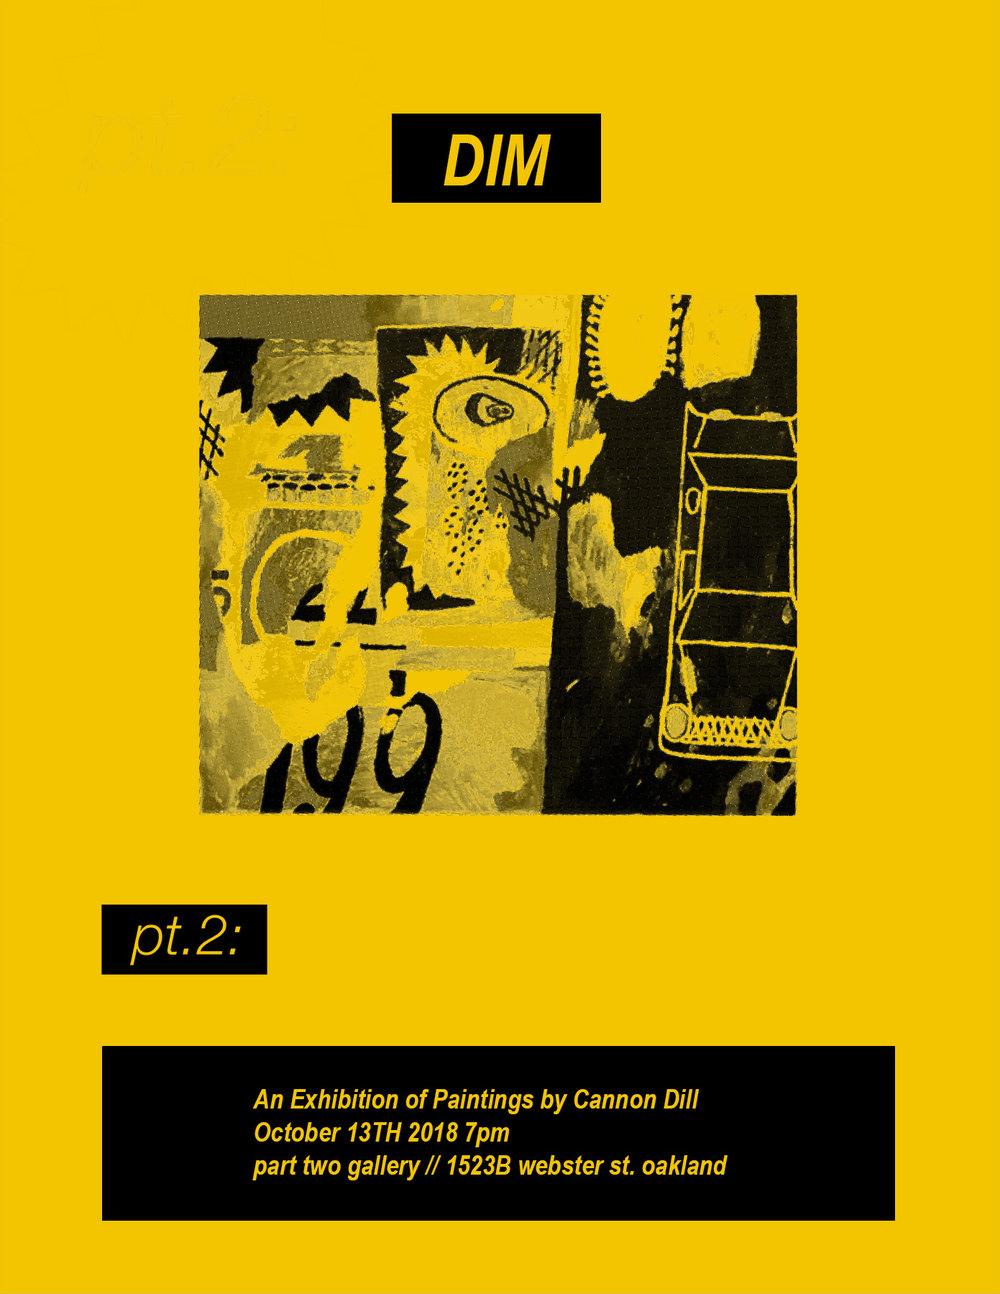 dimflyer2.jpg